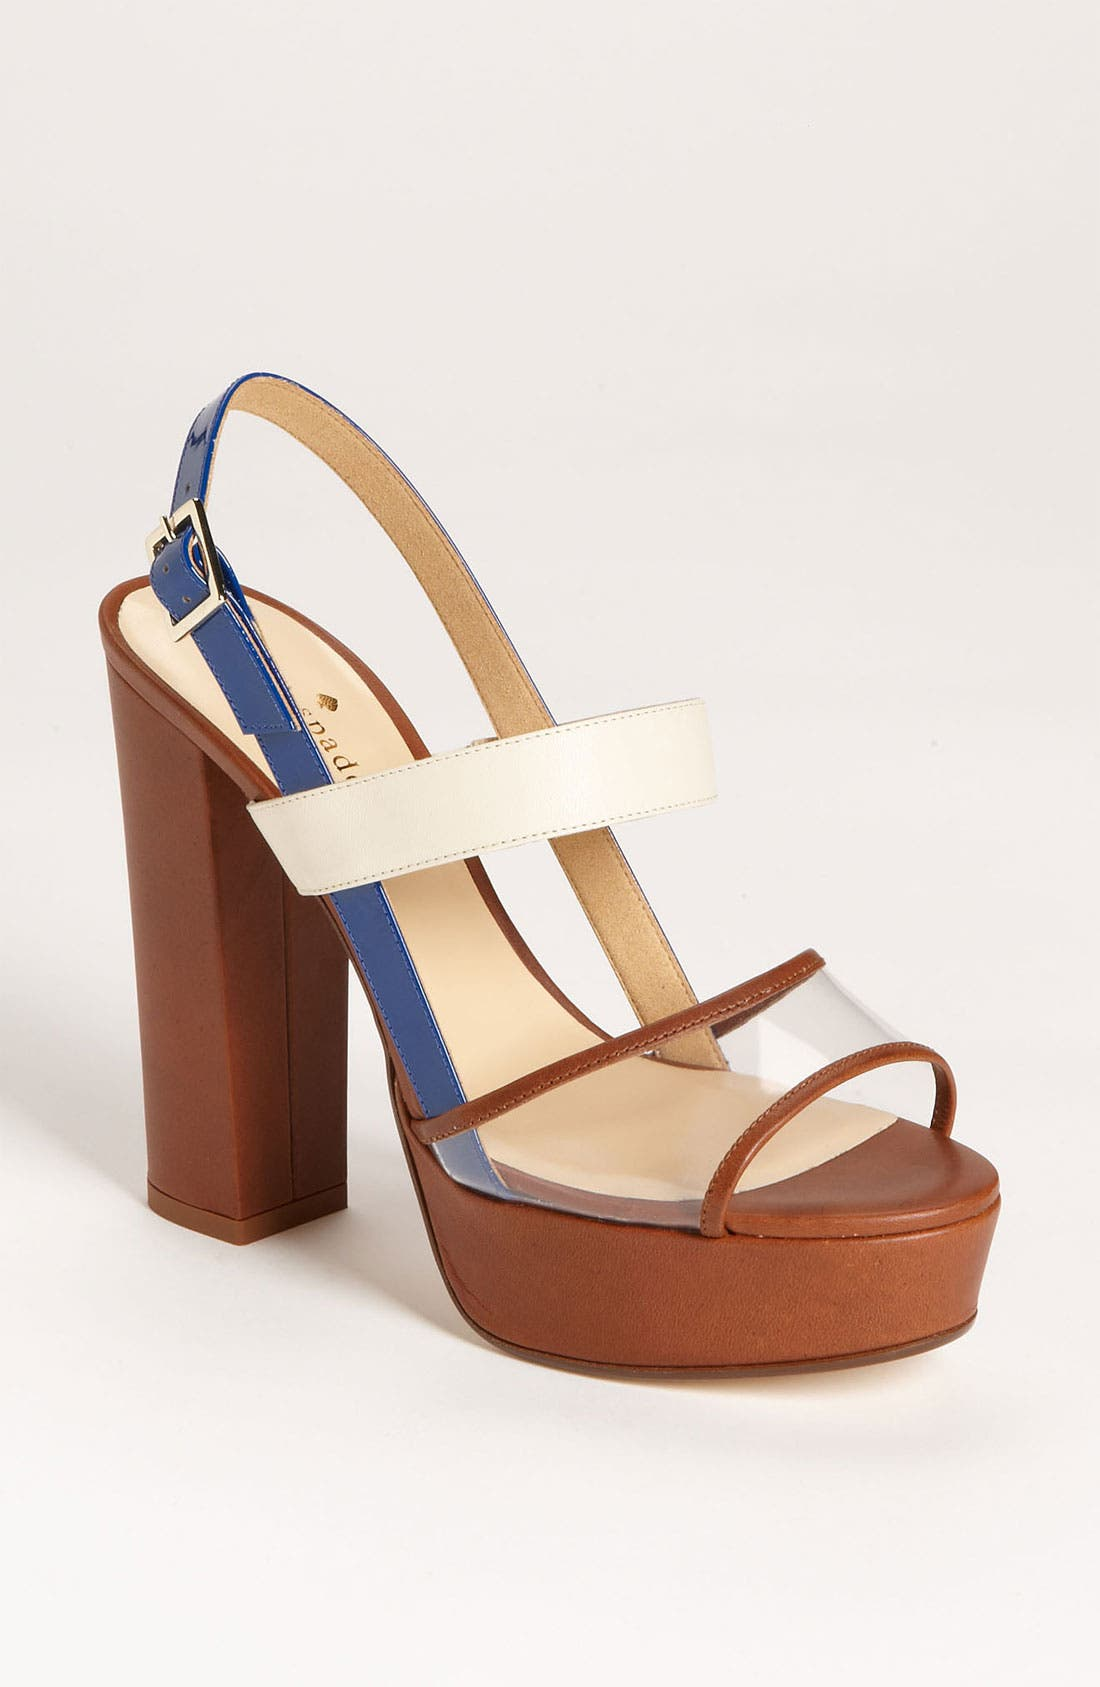 Alternate Image 1 Selected - kate spade new york 'izzy' sandal